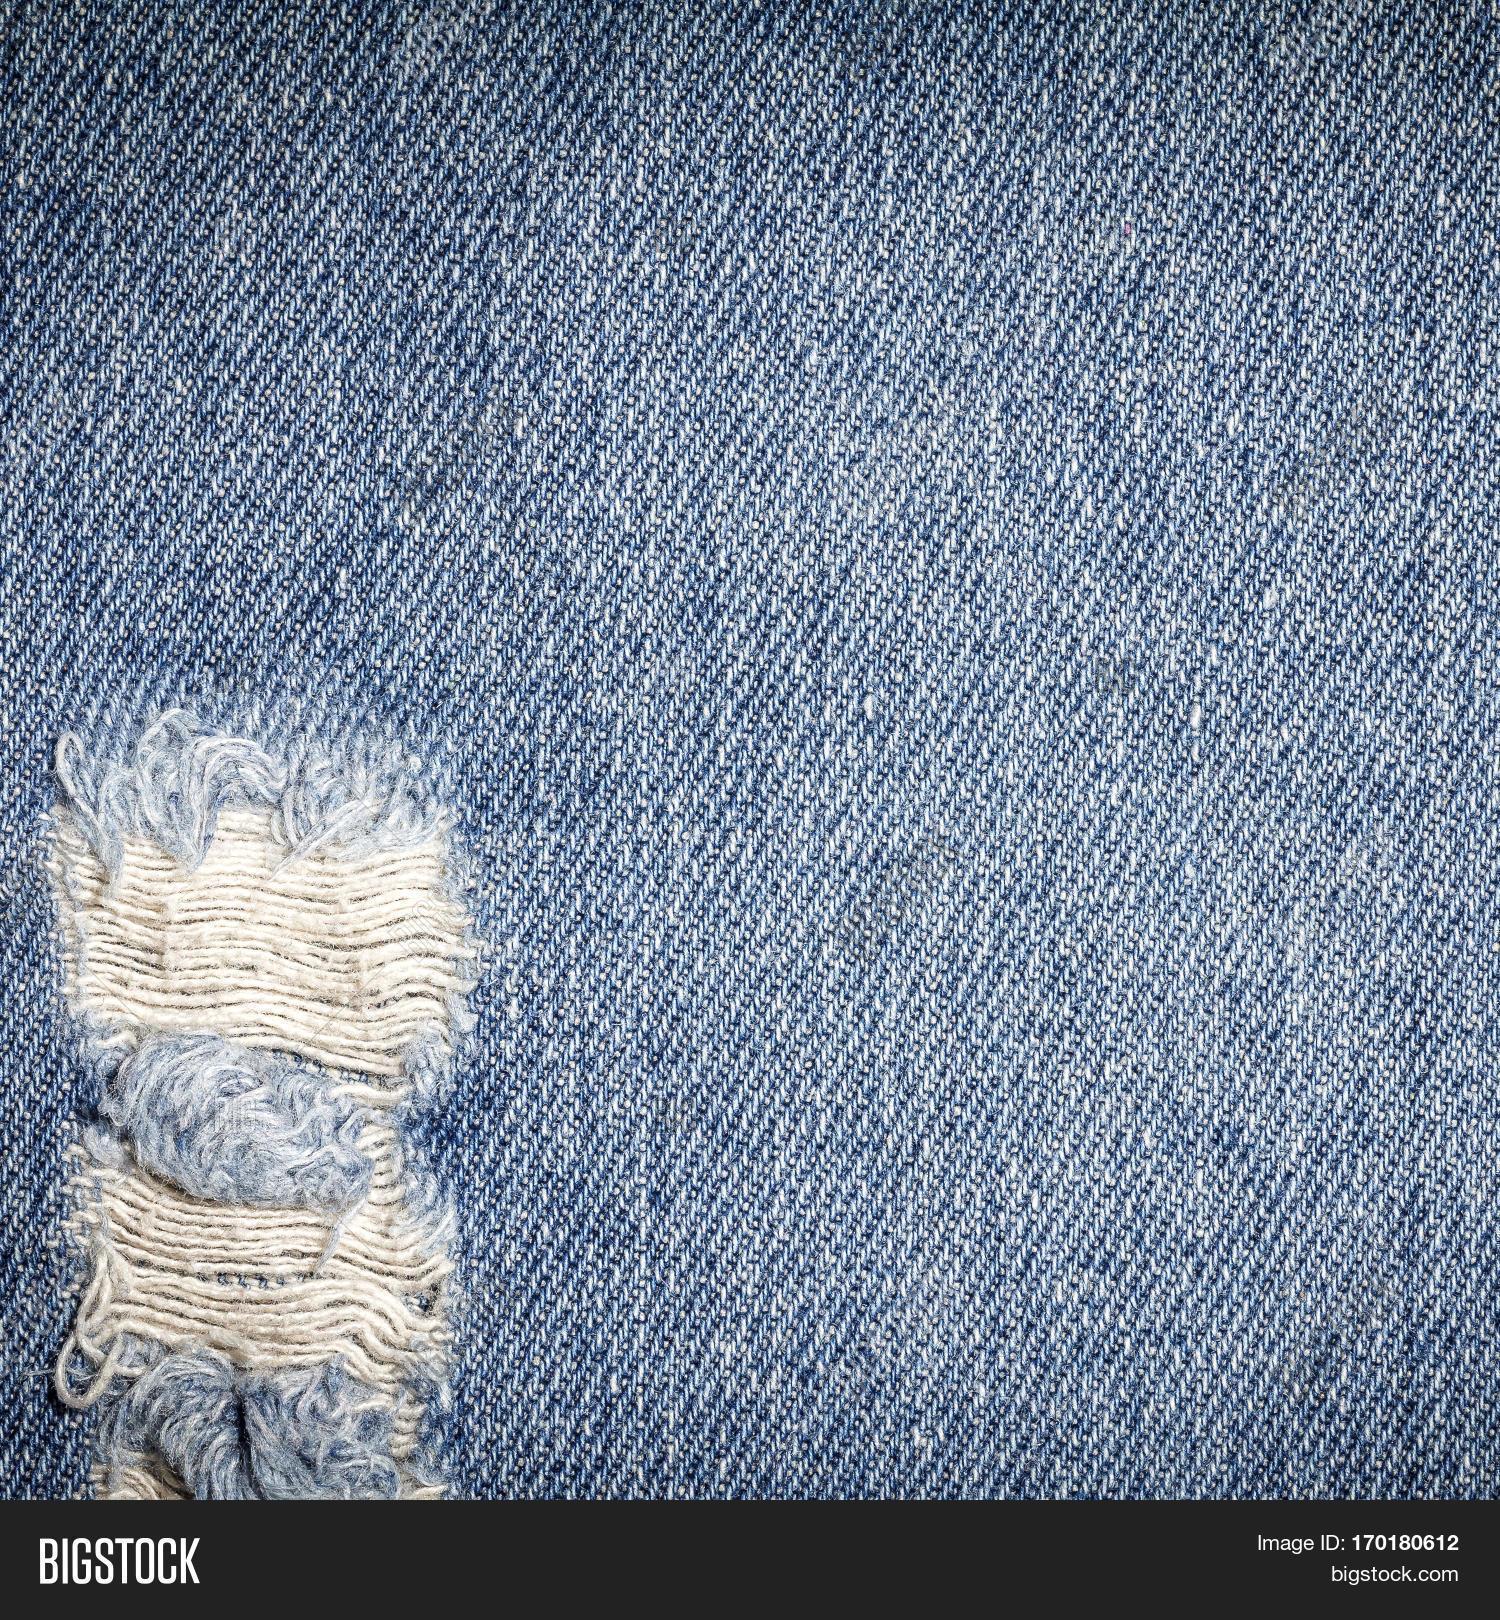 denim jeans texture denim jeans image amp photo bigstock